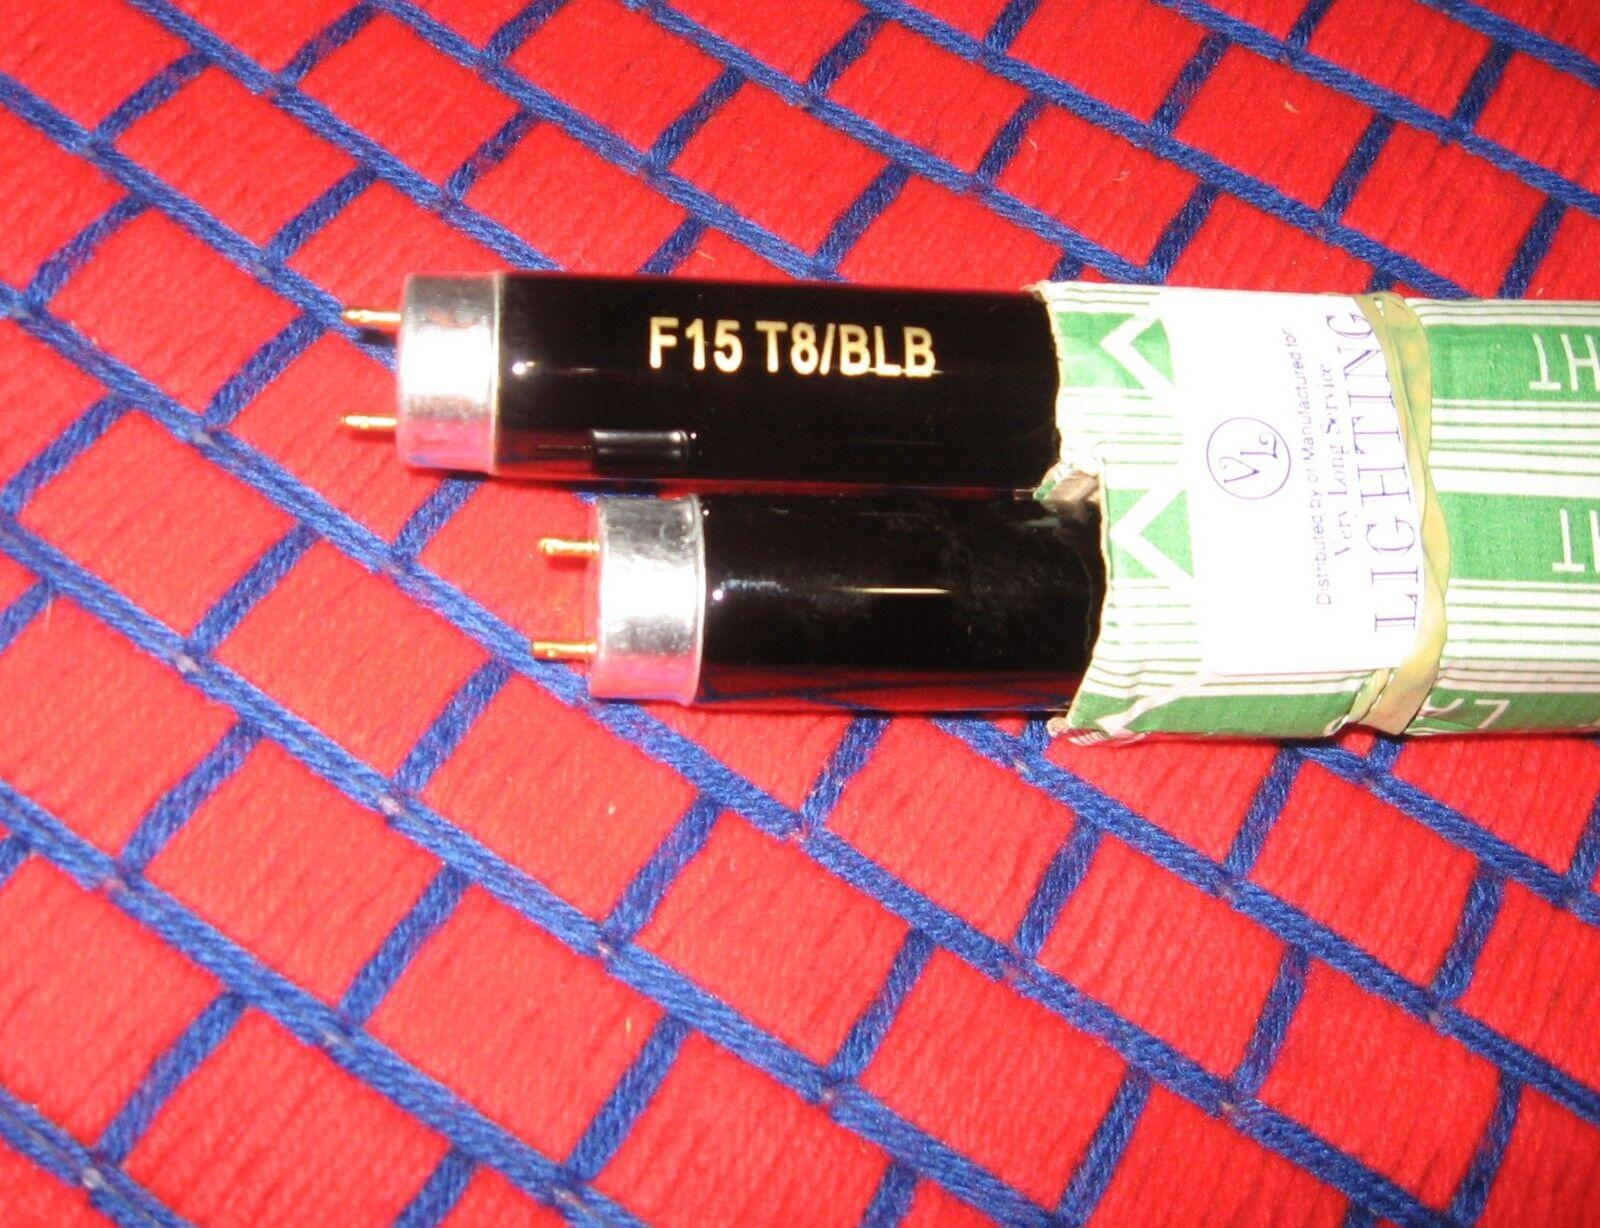 Caja de 6 nuevas Fluorescente F15T8 BLB 18  Negro Azul Claro Bombilla 15w negrolite F15T8